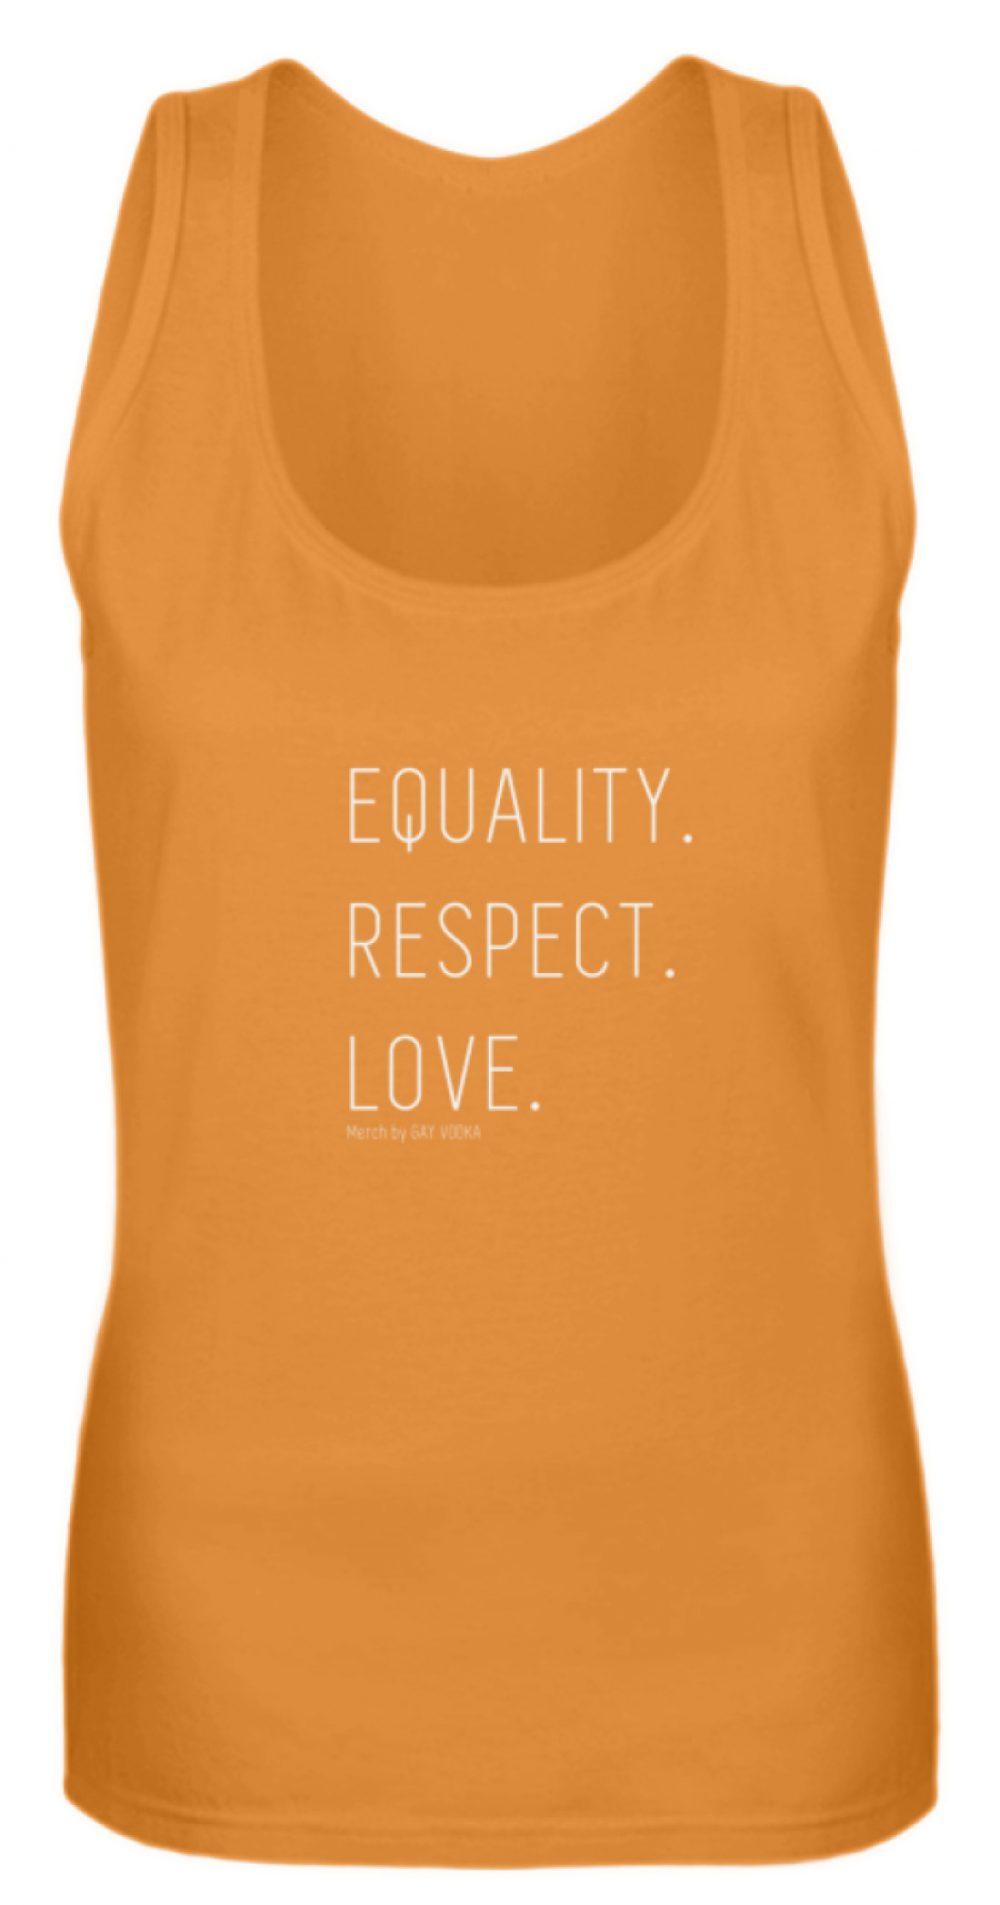 EQUALITY. RESPECT. LOVE. - Frauen Tanktop-20